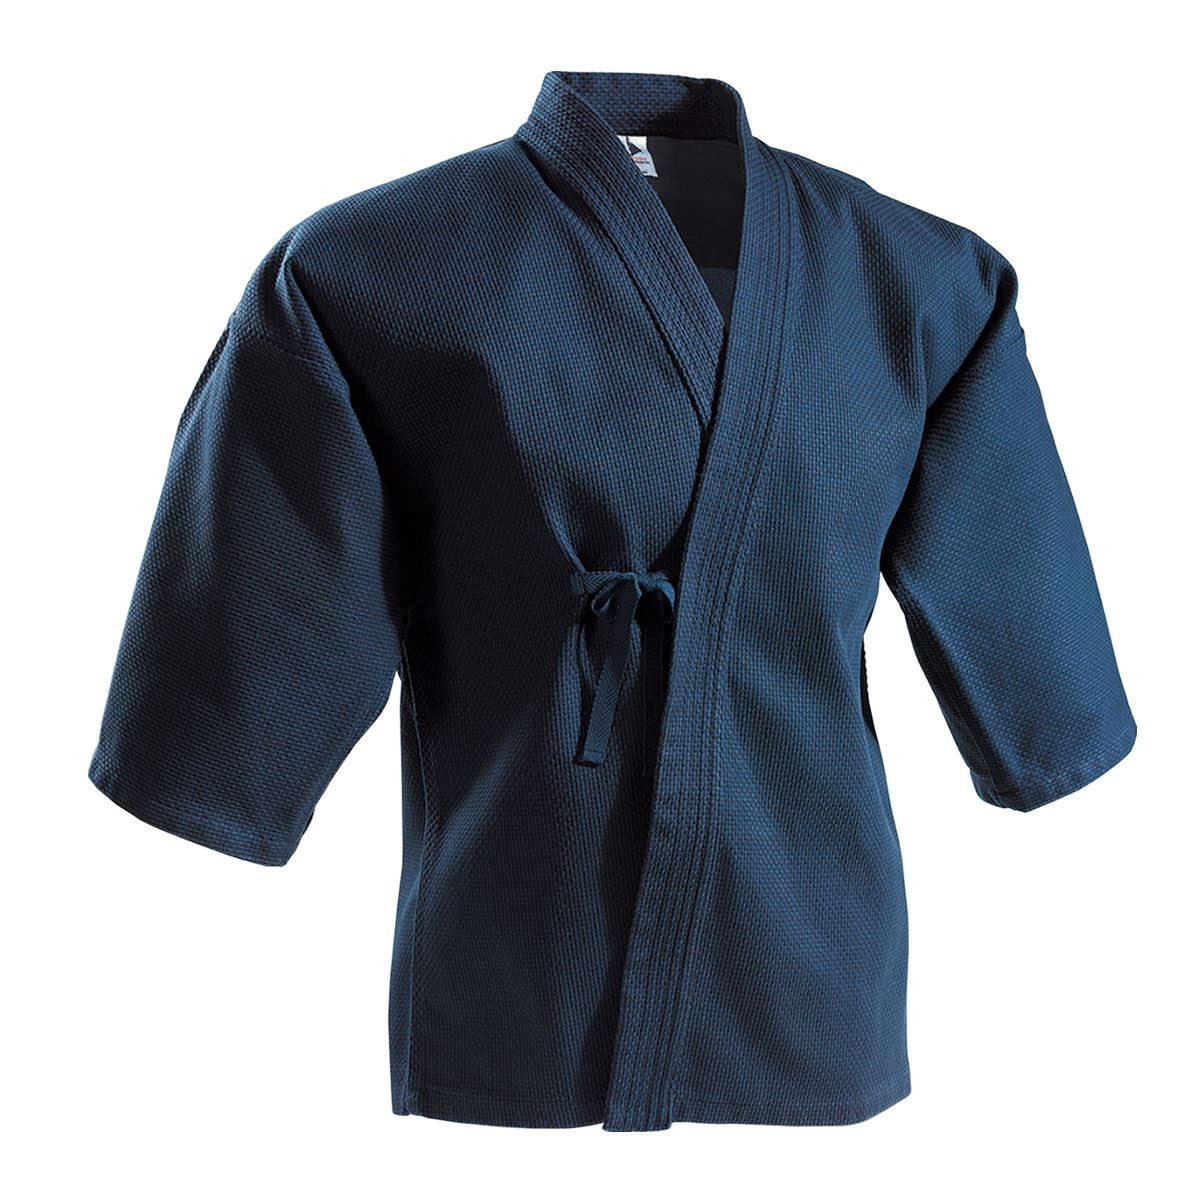 Century Martial Arts 15 oz. Single Layer Keikogi